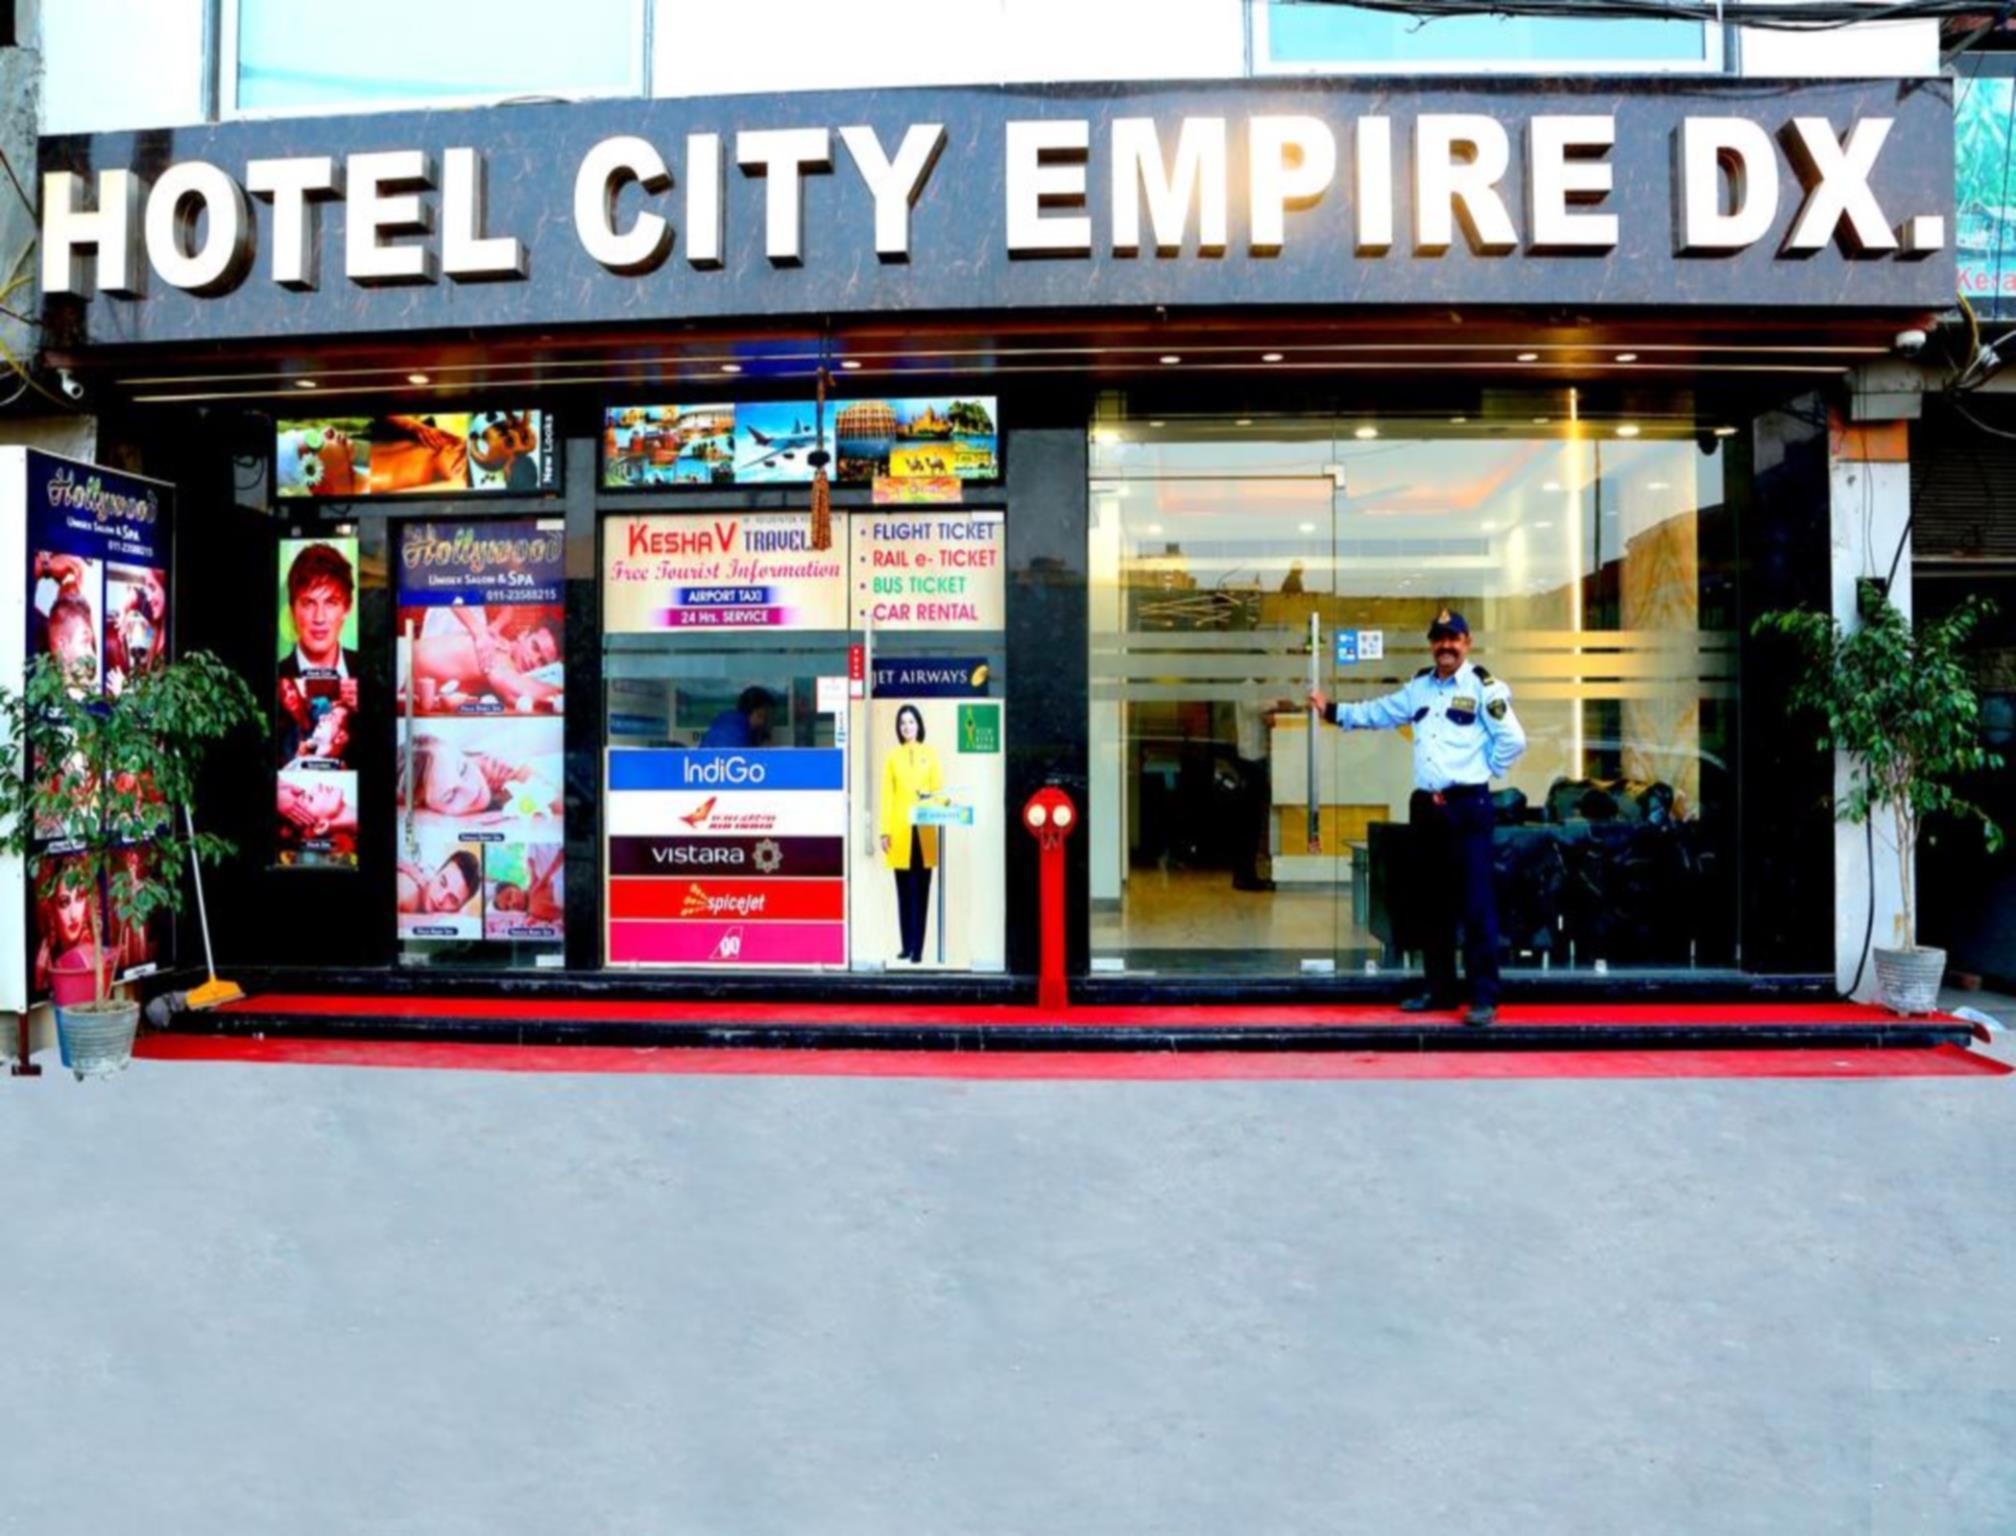 Hotel City Empire Dx